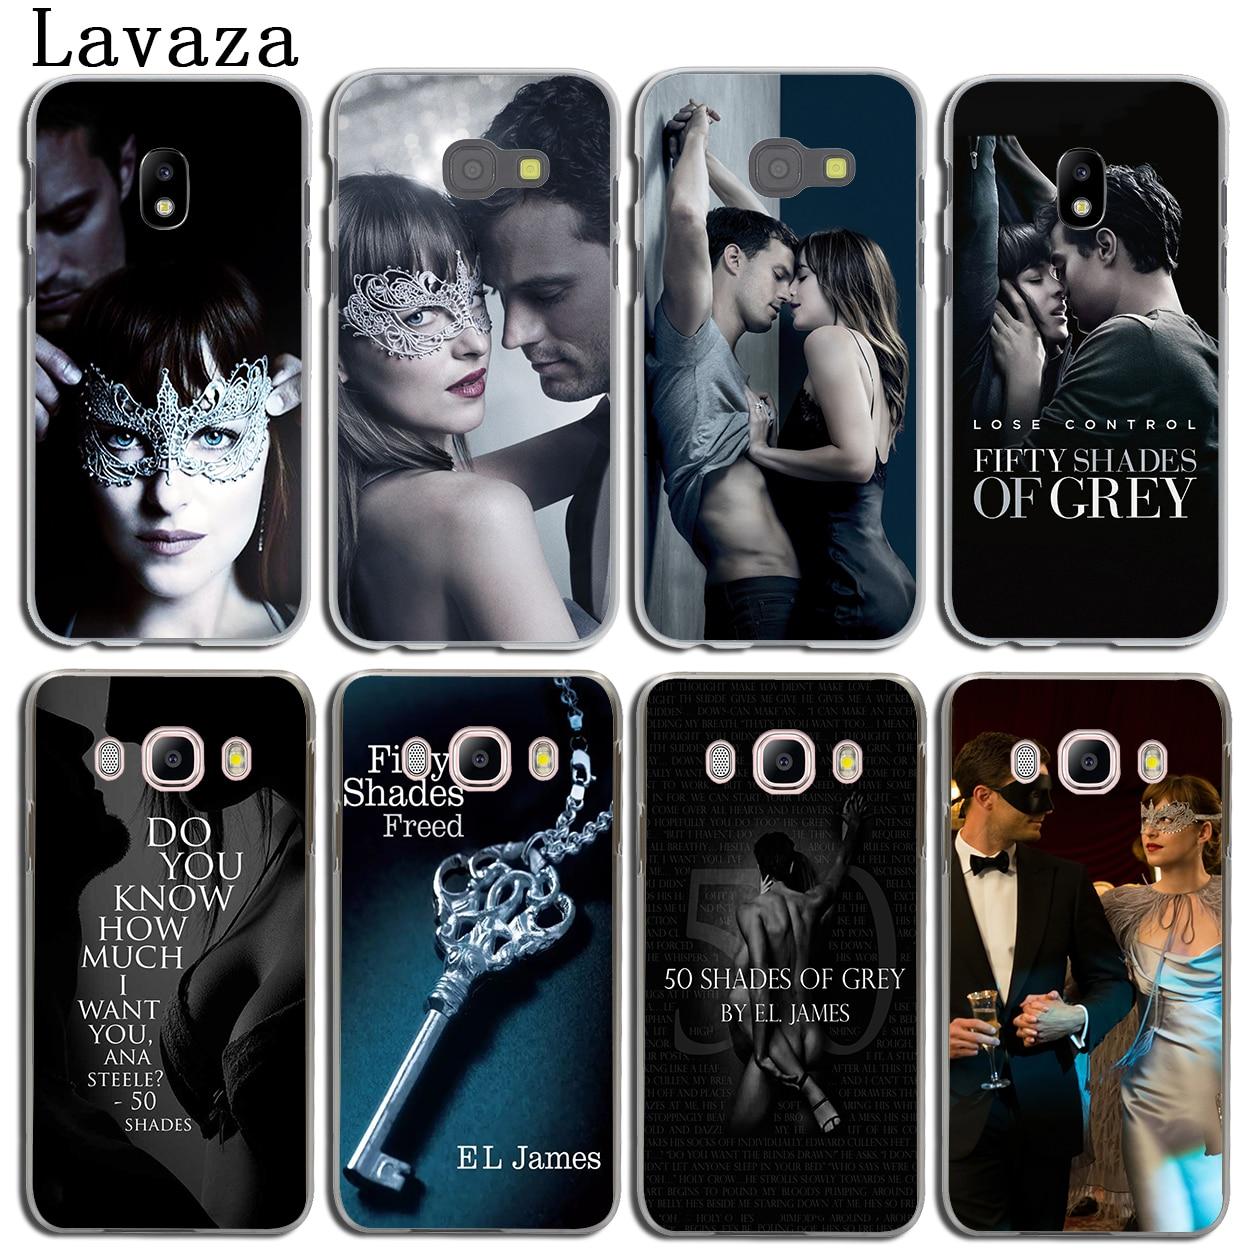 Lavaza Fifty Shades Darker of grey freed Phone Case for Samsung Galaxy J3 J1 J2 J7 J5 20 ...